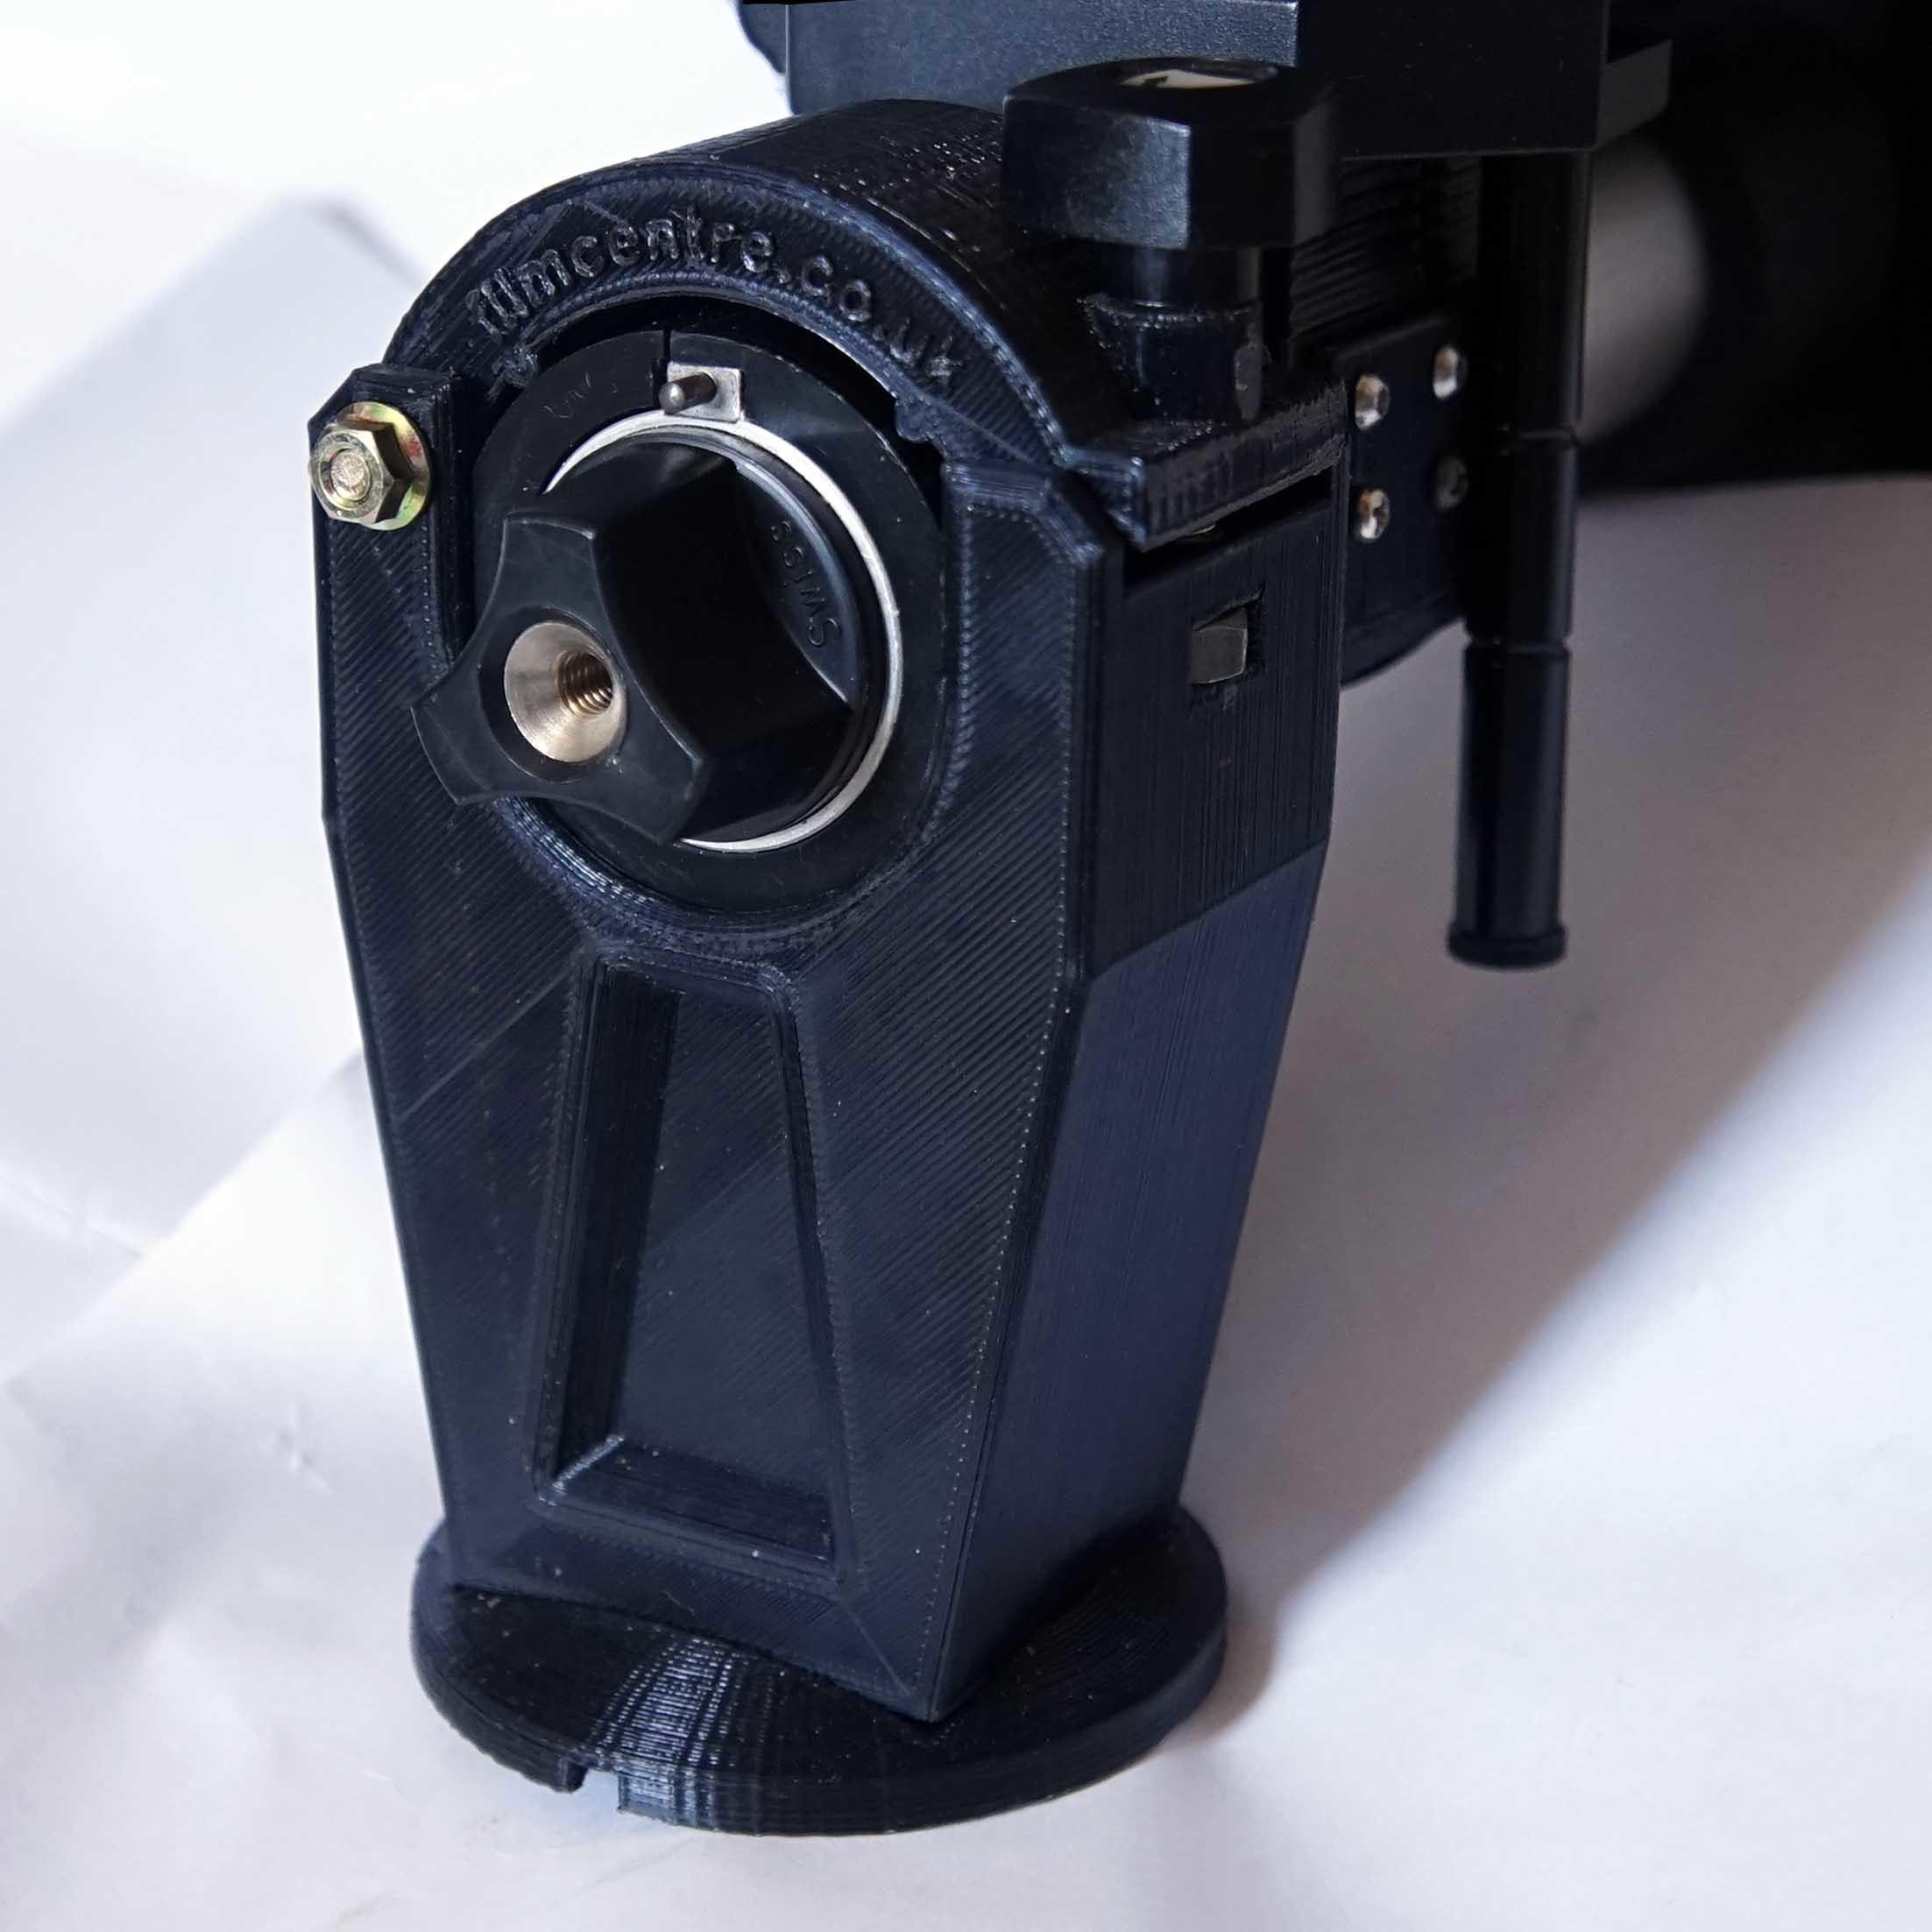 sinar-tripod-mount-pillar1.JPG Download STL file Sinar rail clamp (camera/tripod support) & F1 repairs • 3D printing object, vintage-lens